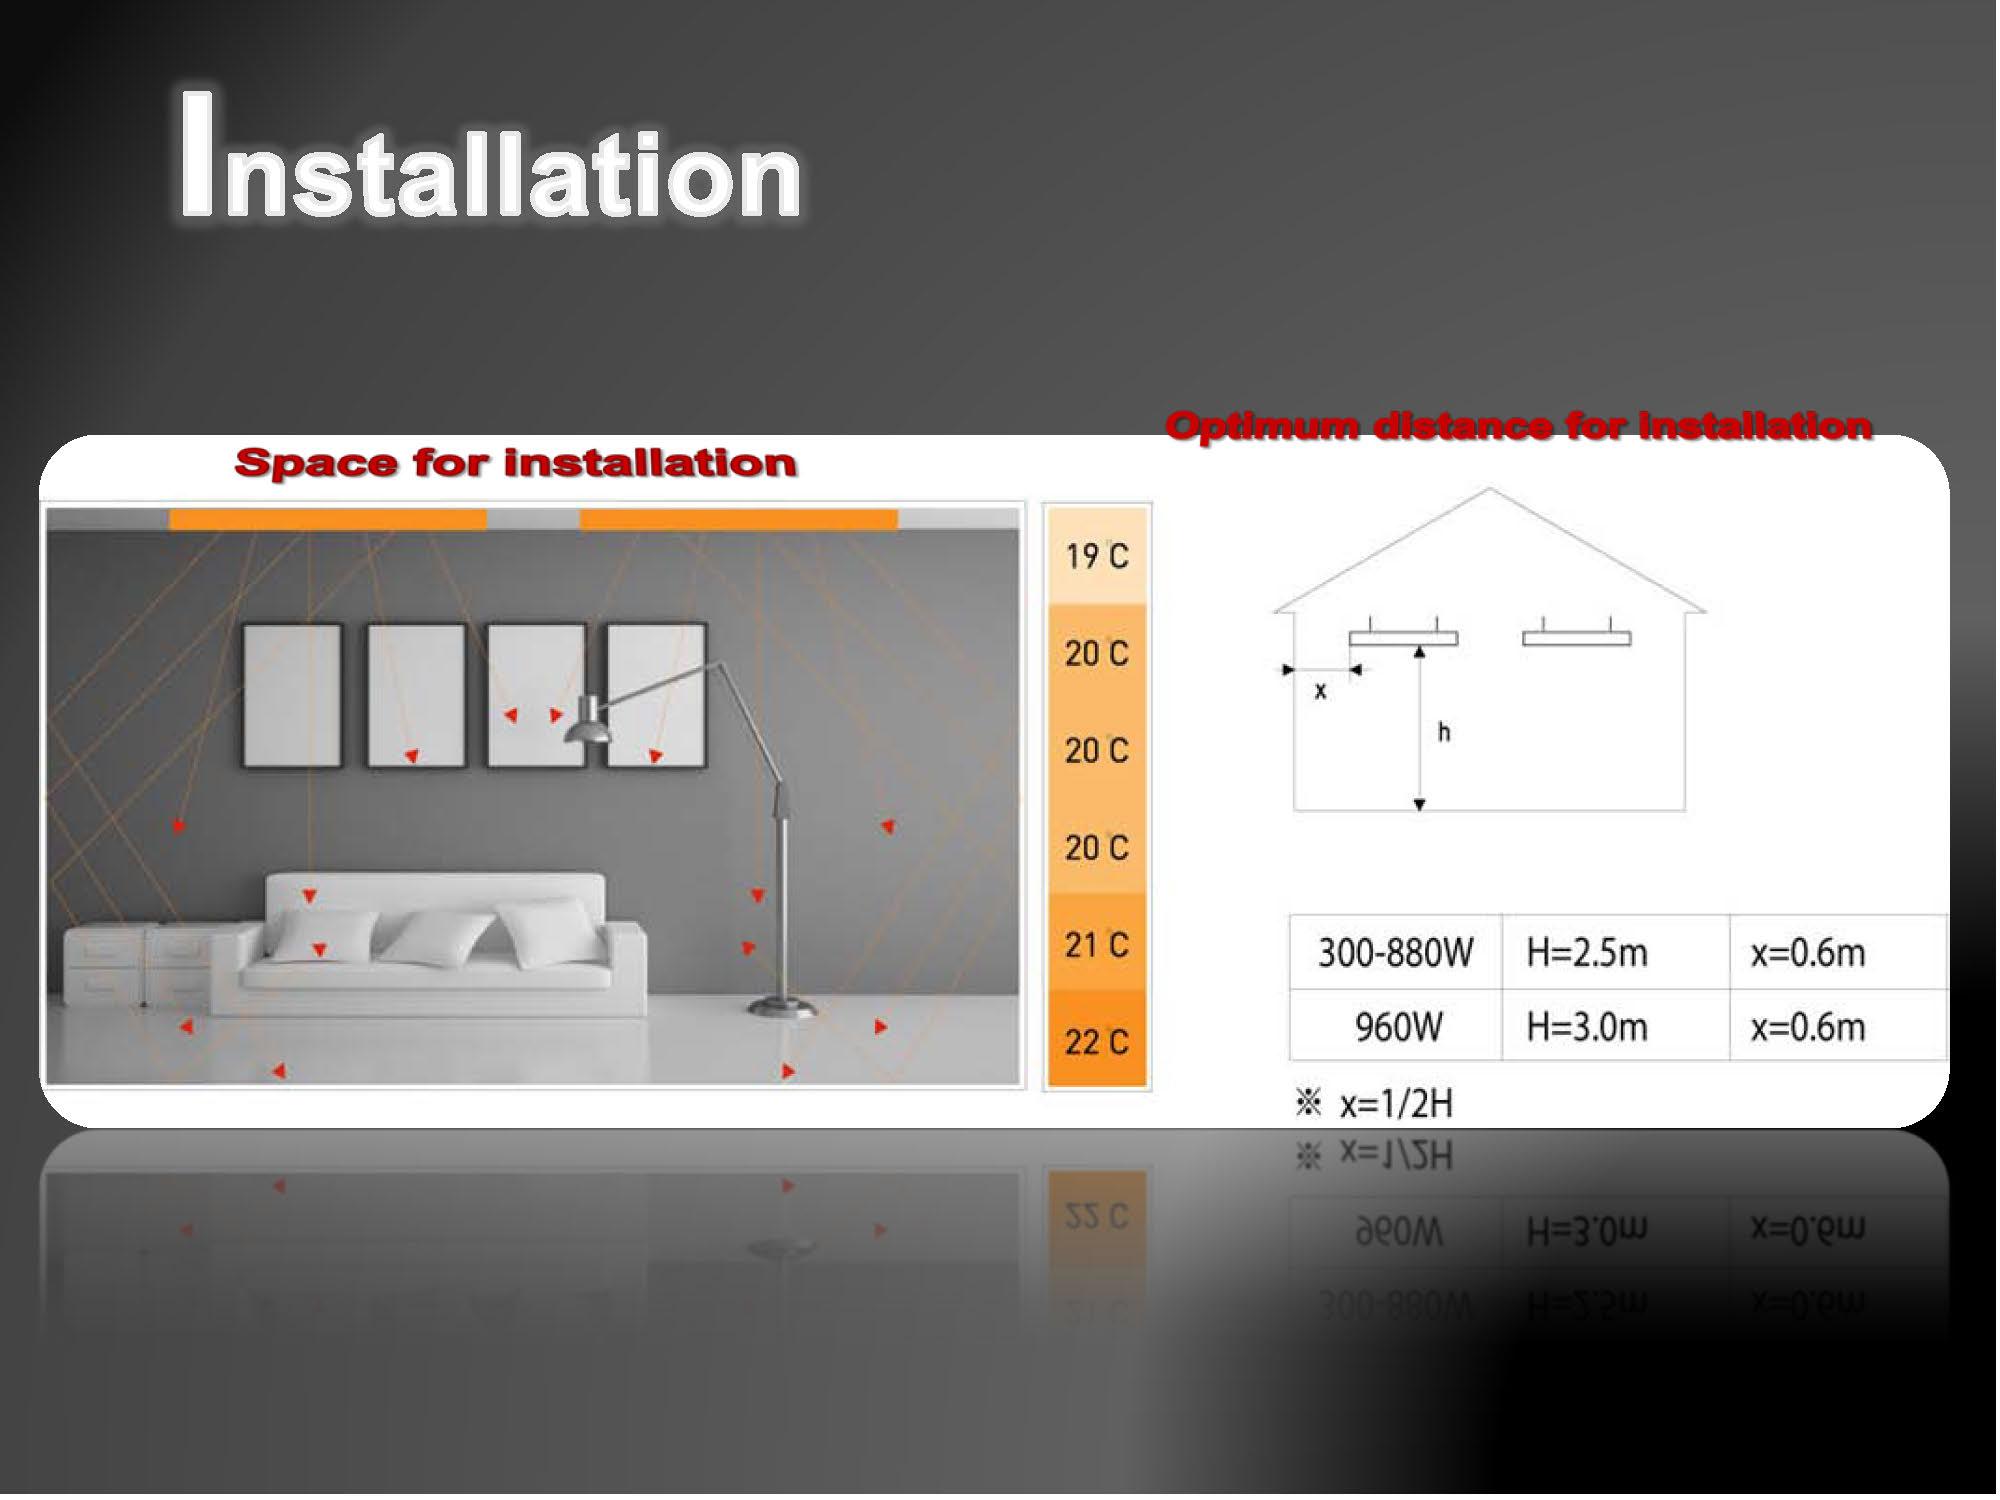 ir heizung infrarot heizung mit led licht infrarotheizung heizung steuerung thermostate heizung. Black Bedroom Furniture Sets. Home Design Ideas